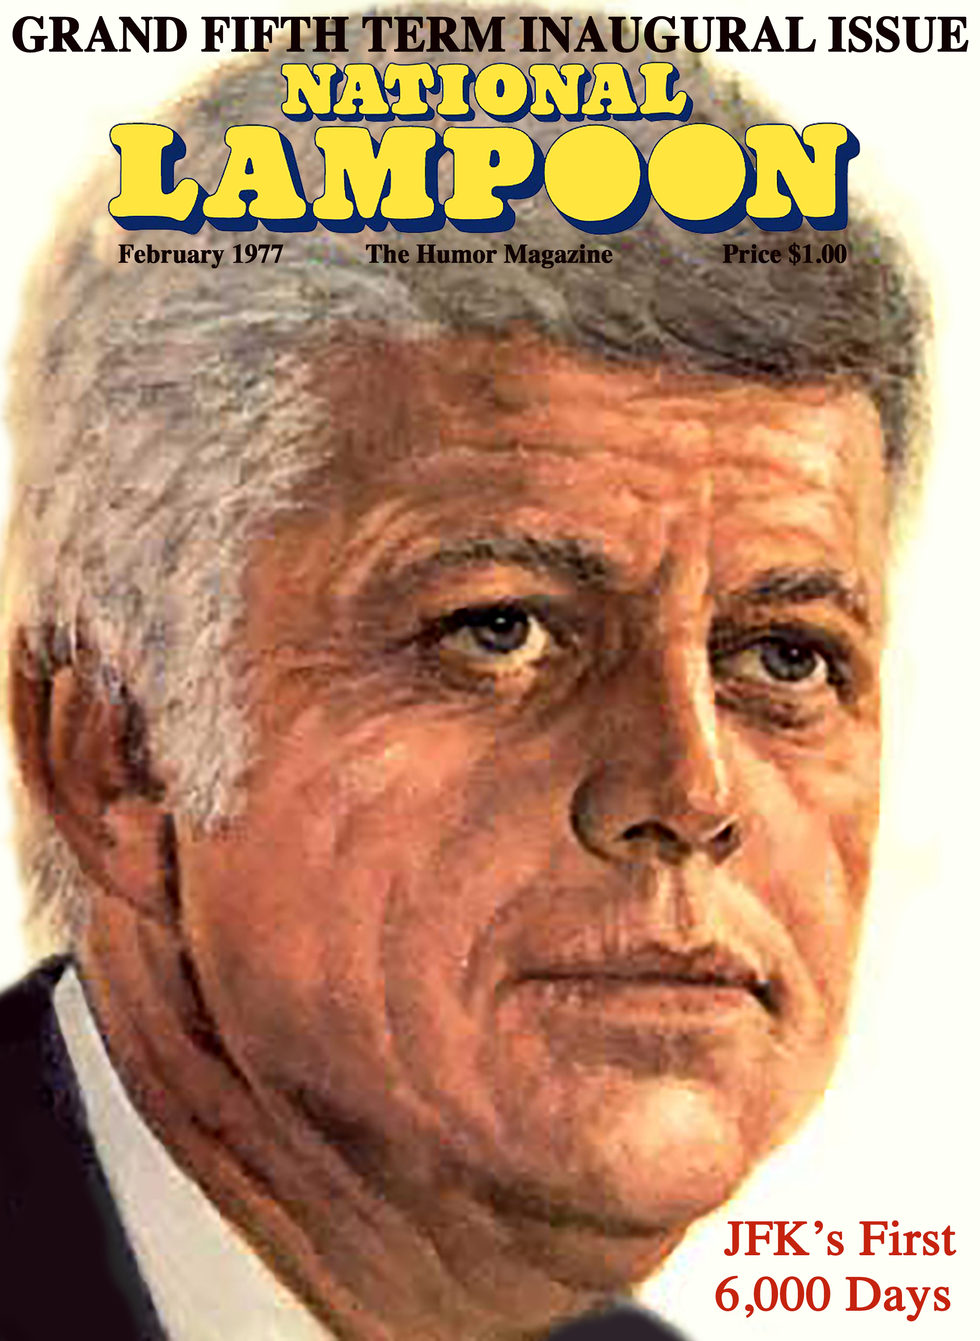 Kennedy's Fifth Term